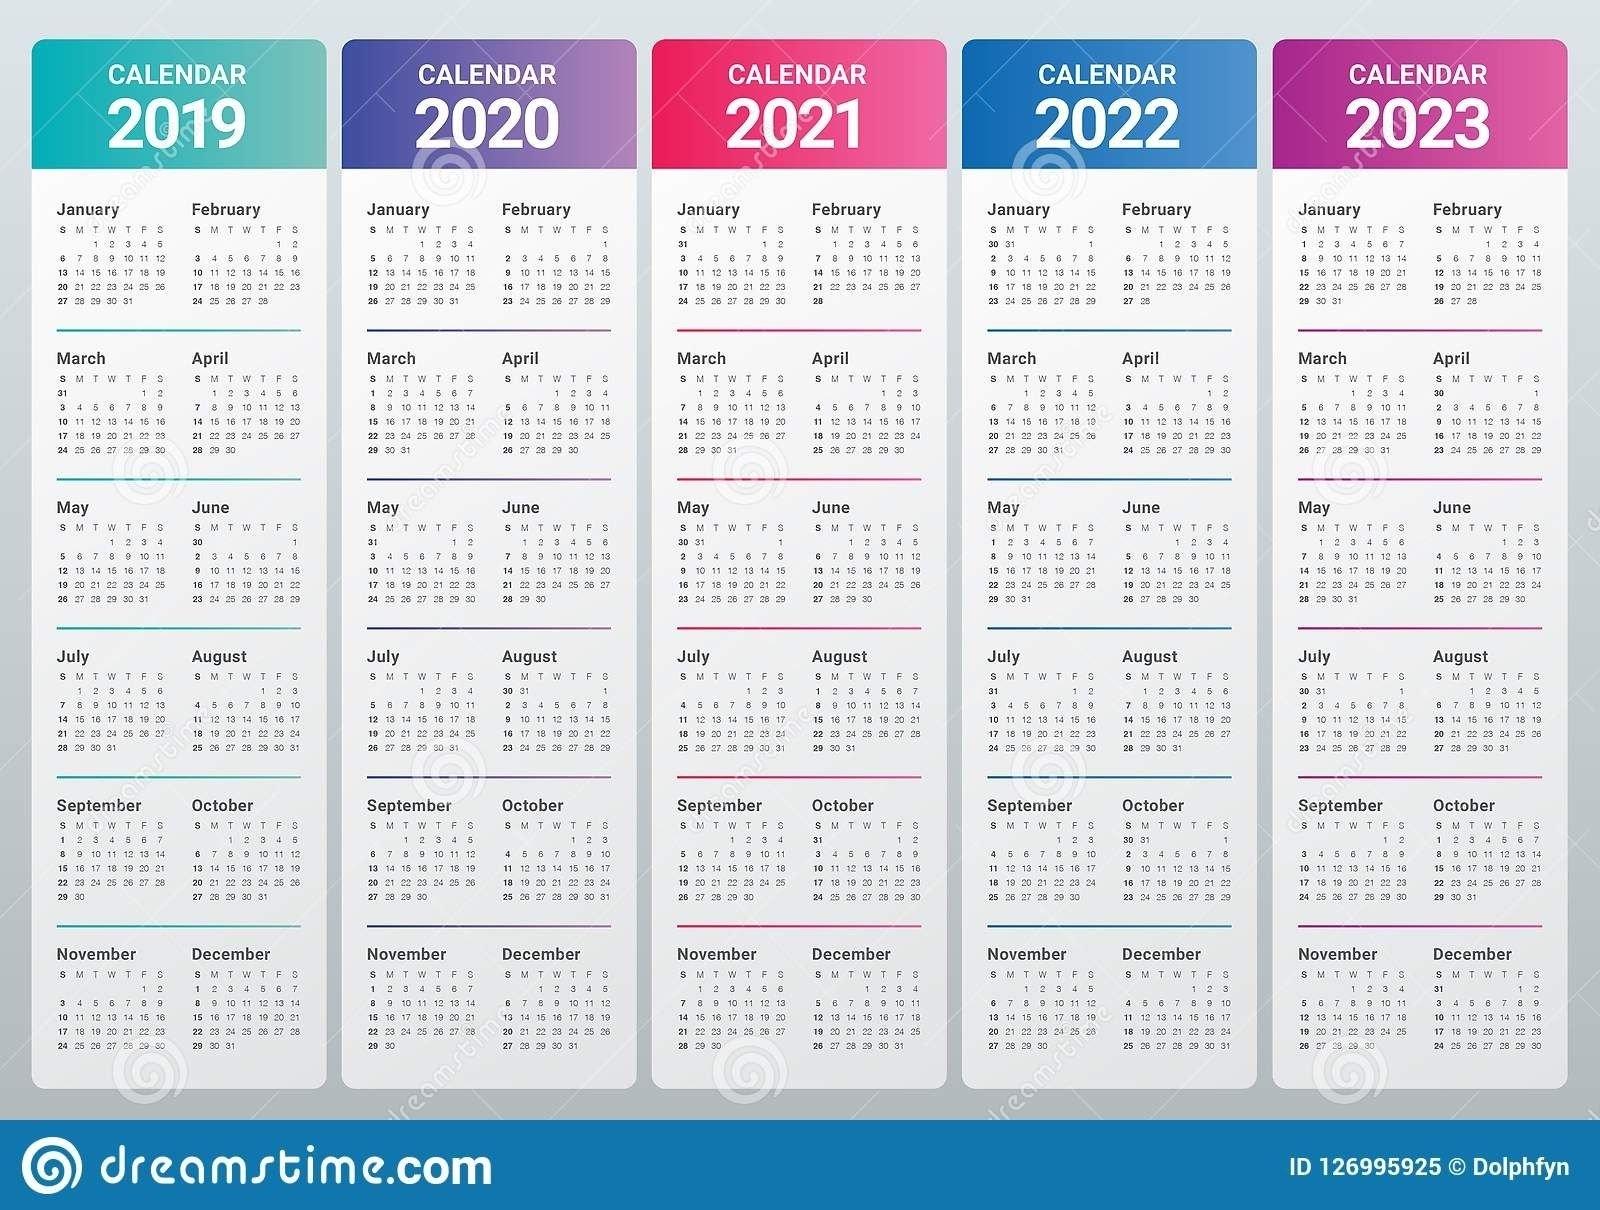 Effective Free Printable 5 Year Calendar | Get Your Calendar Printable within 2021 To 2025 Calendar Image